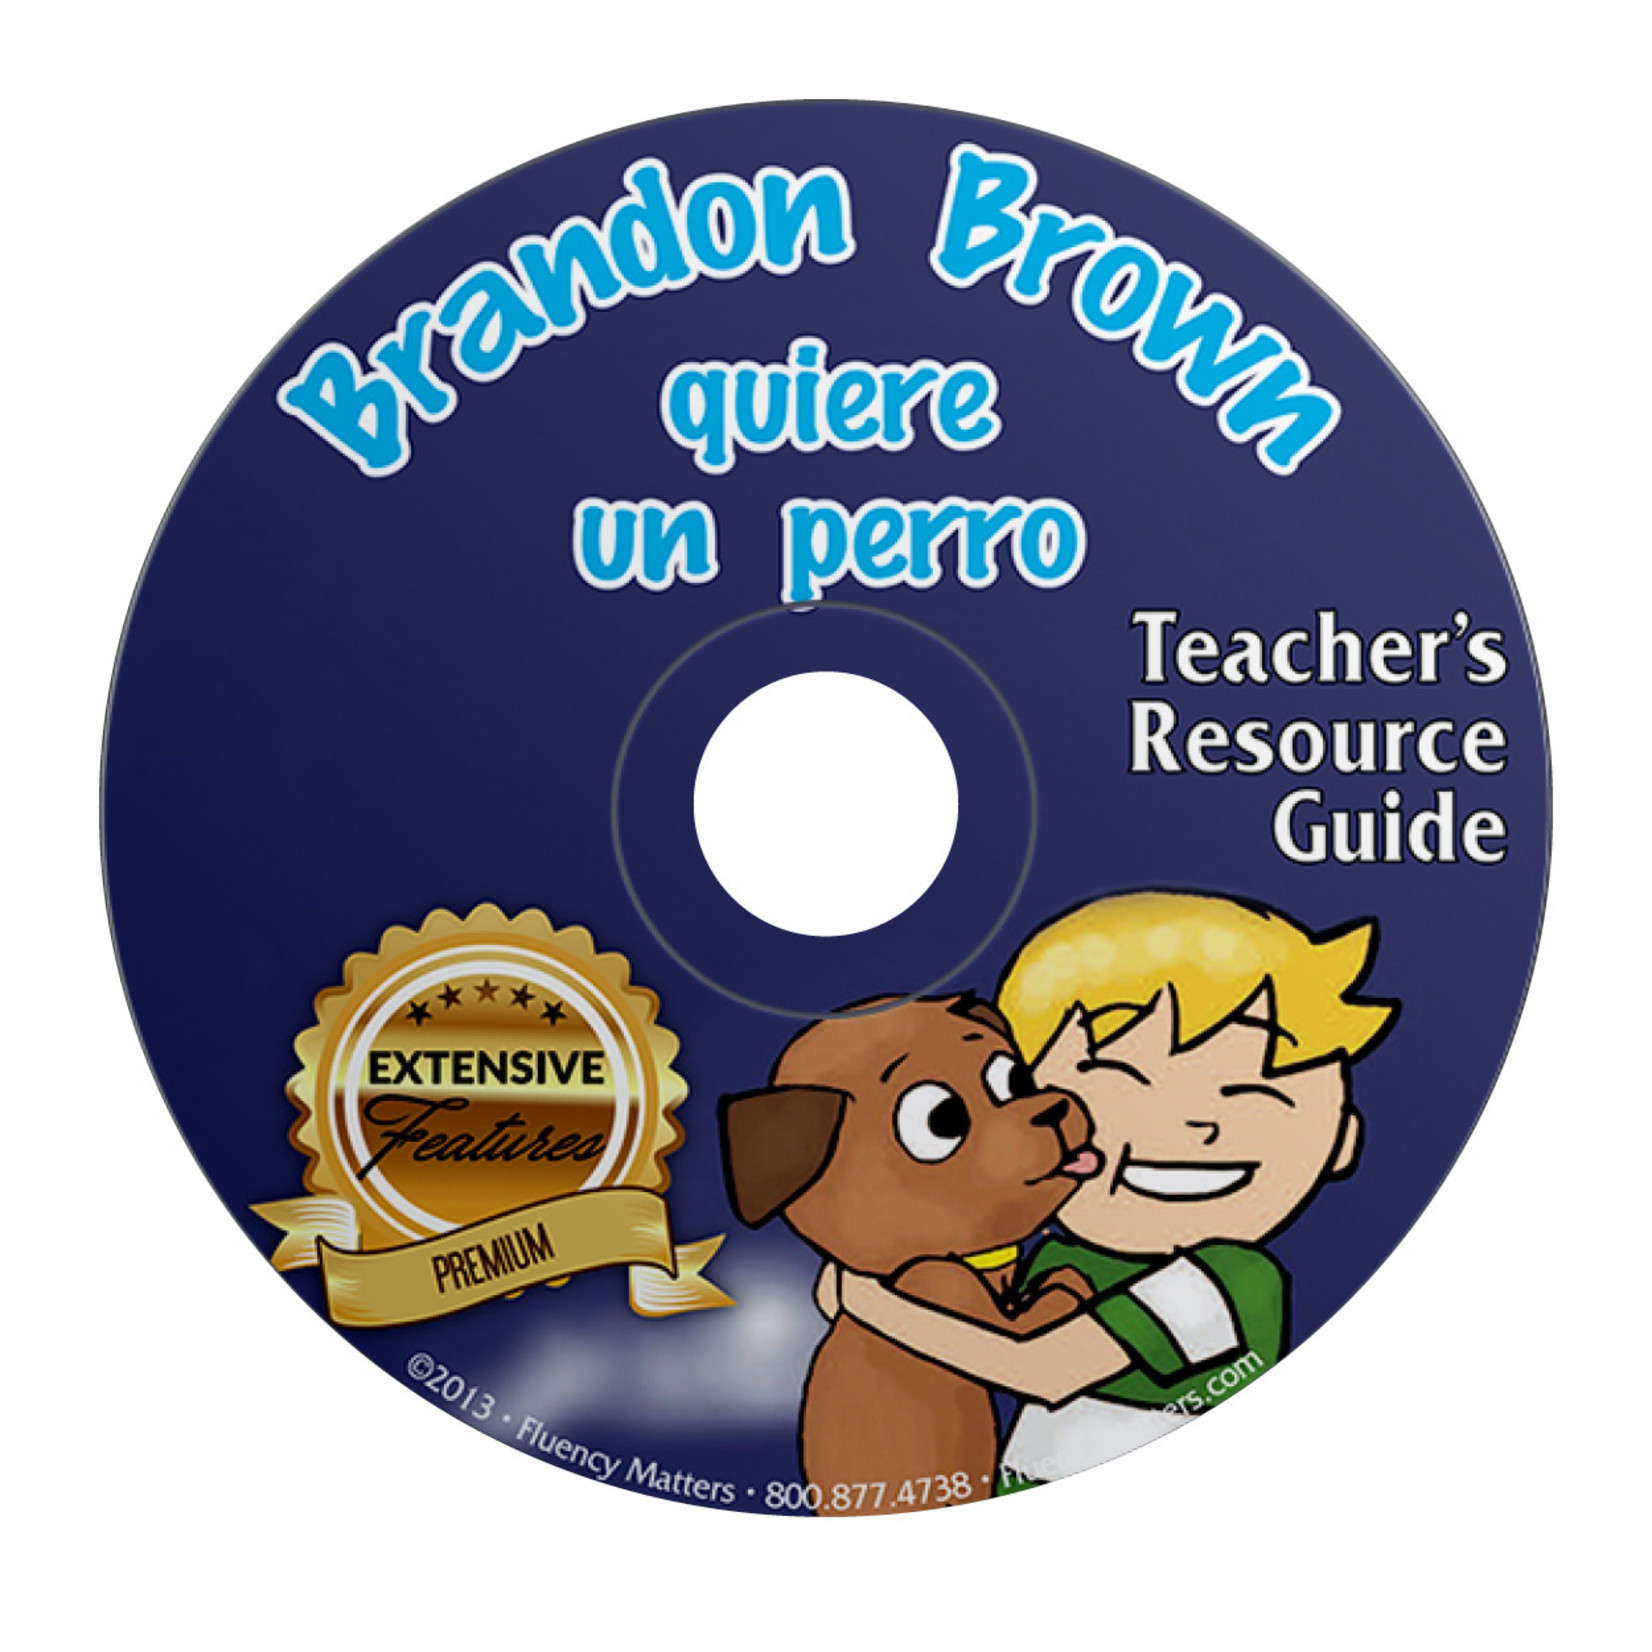 Fluency Matters Brandon Brown quiere un perro - Teacher's Guide on CD